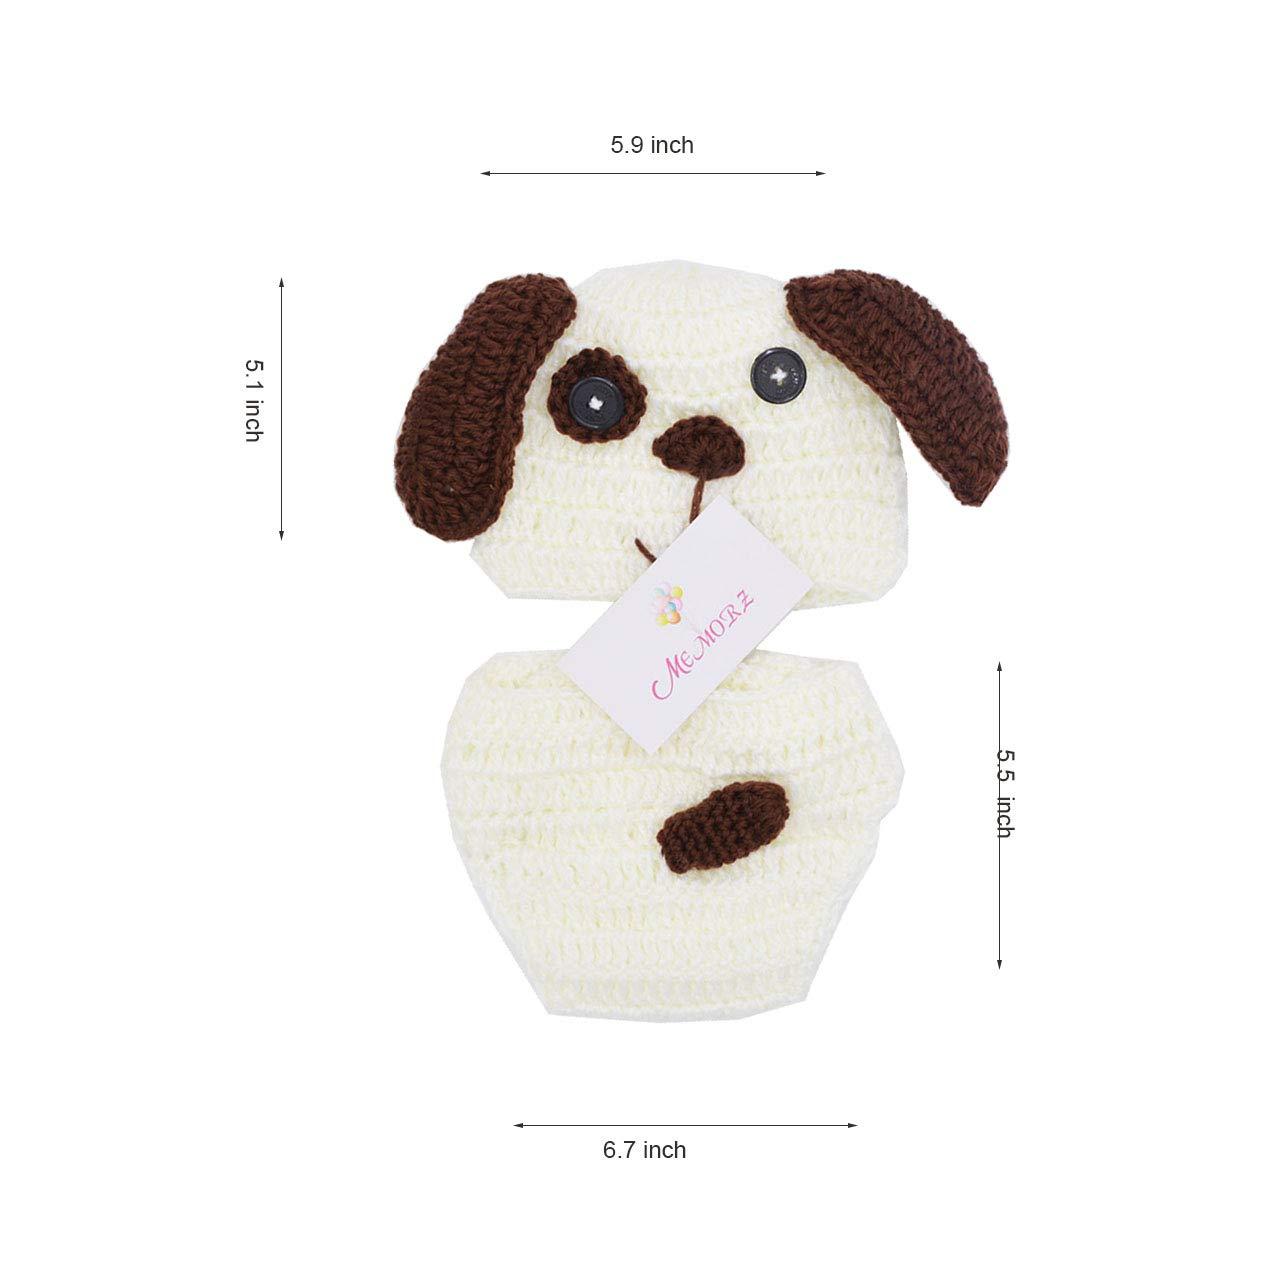 Memorz Newborn Infant Girl Boy Crochet Knit Costume Dog Photo Outfits Clothes Cap Prop (Beige Dog)